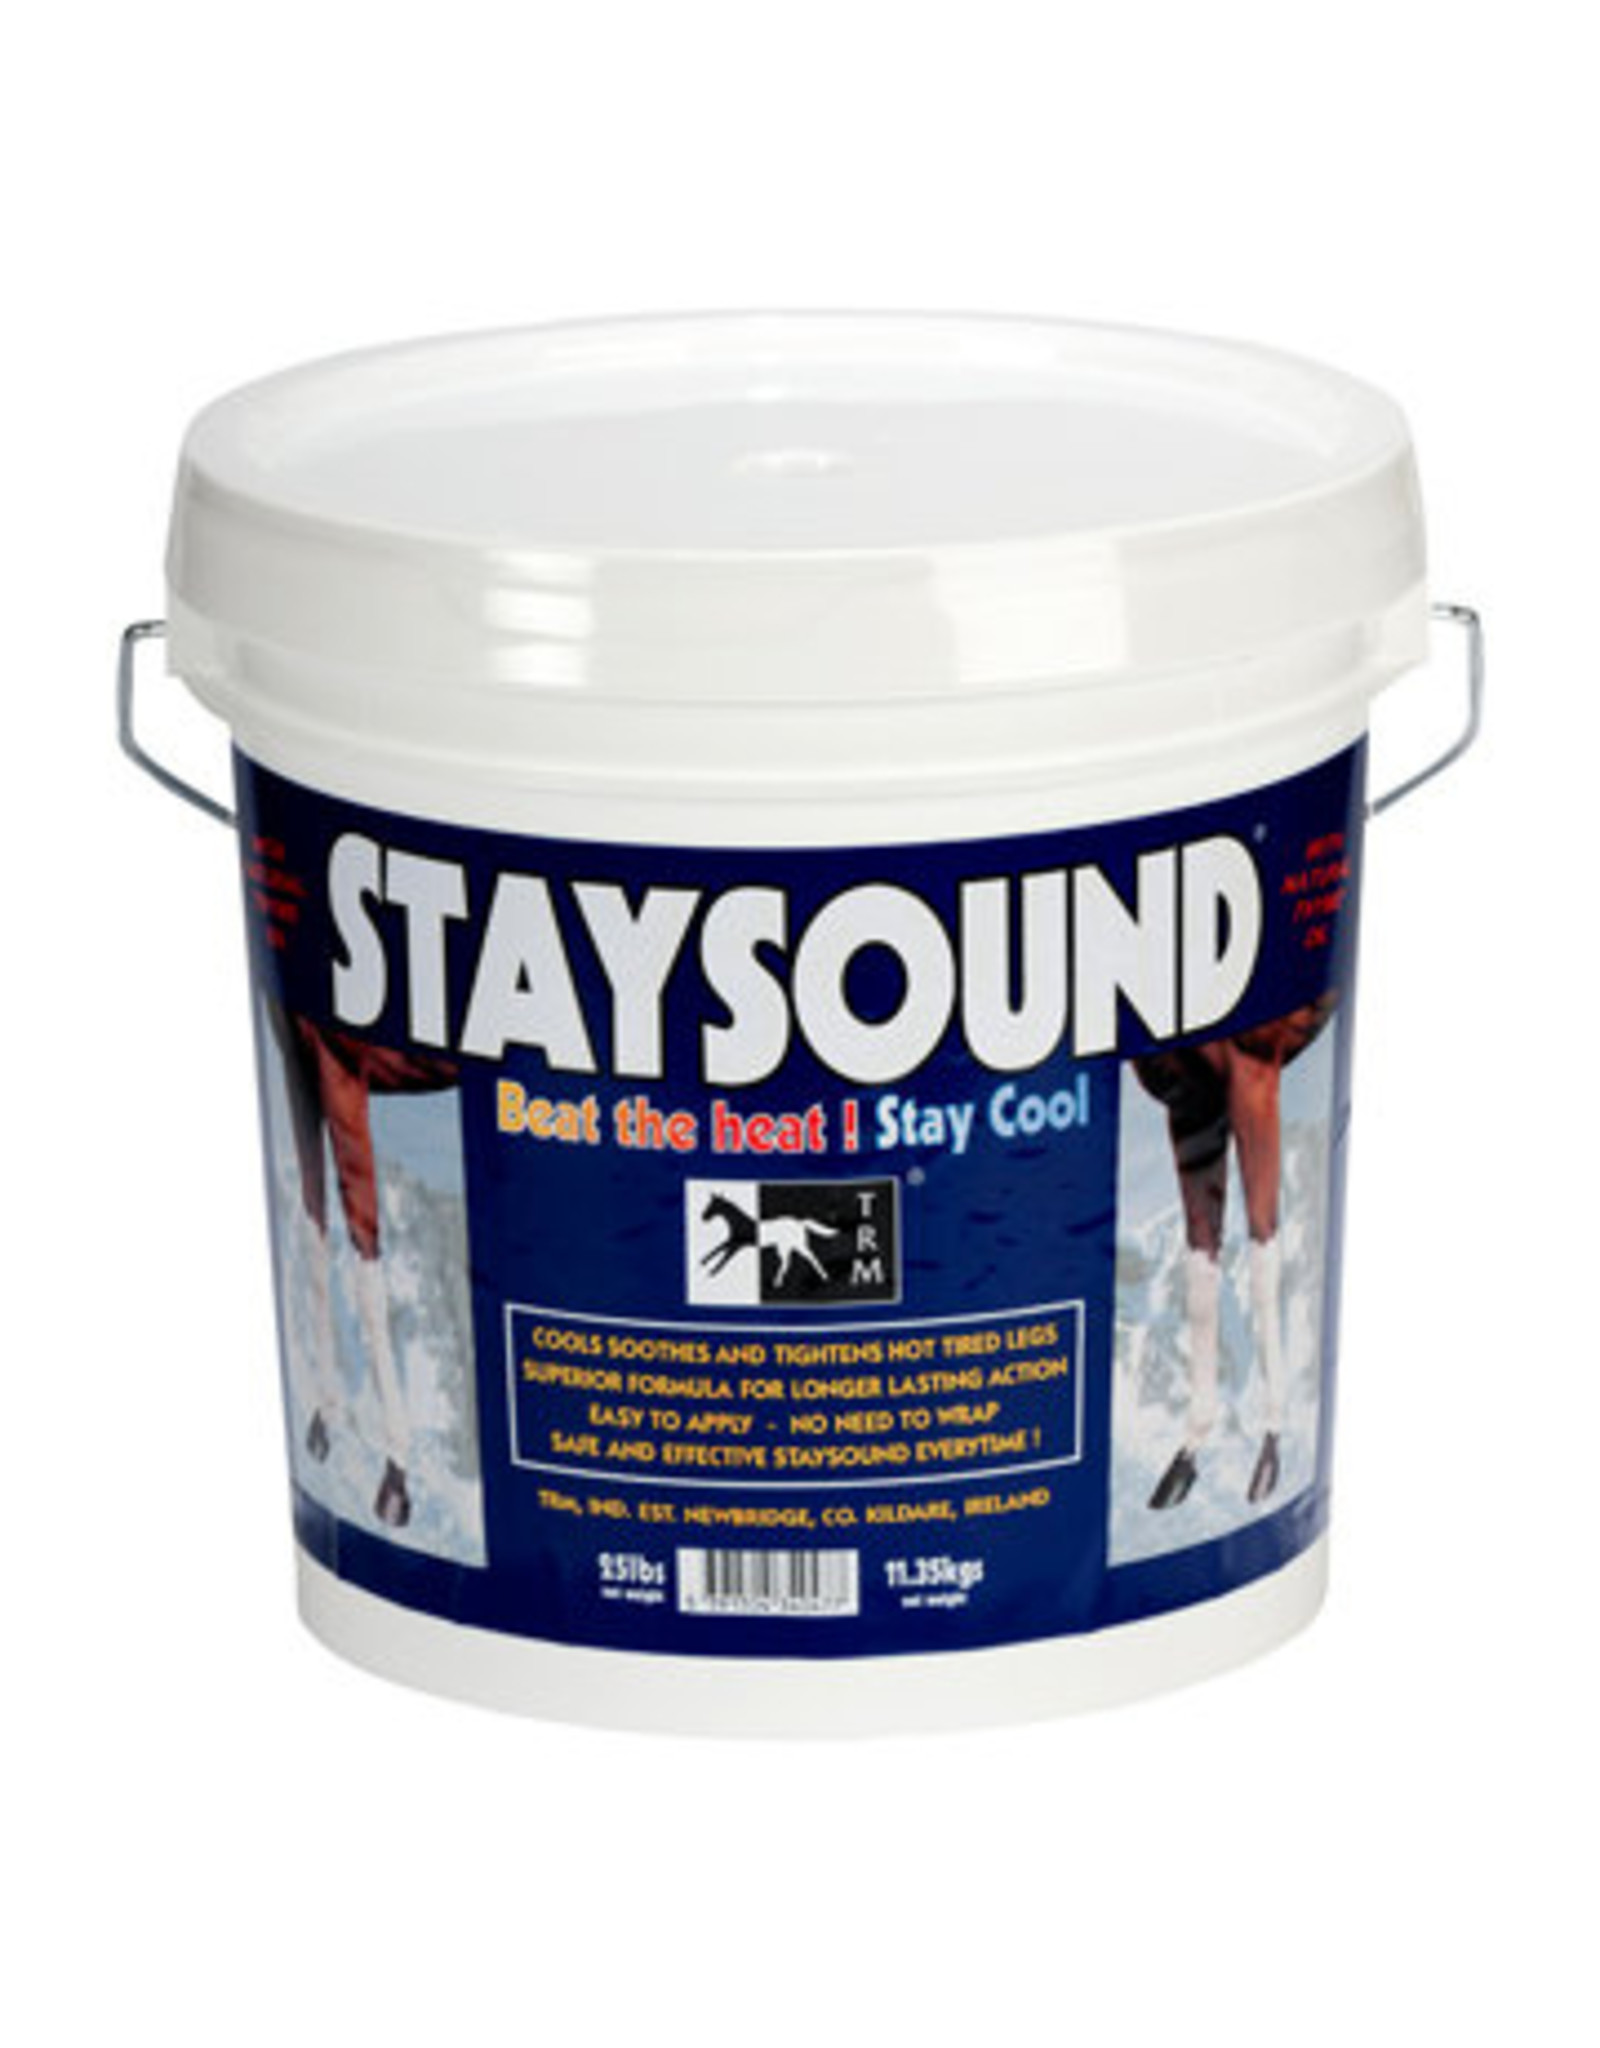 TRM Staysound Clay 11,35kg